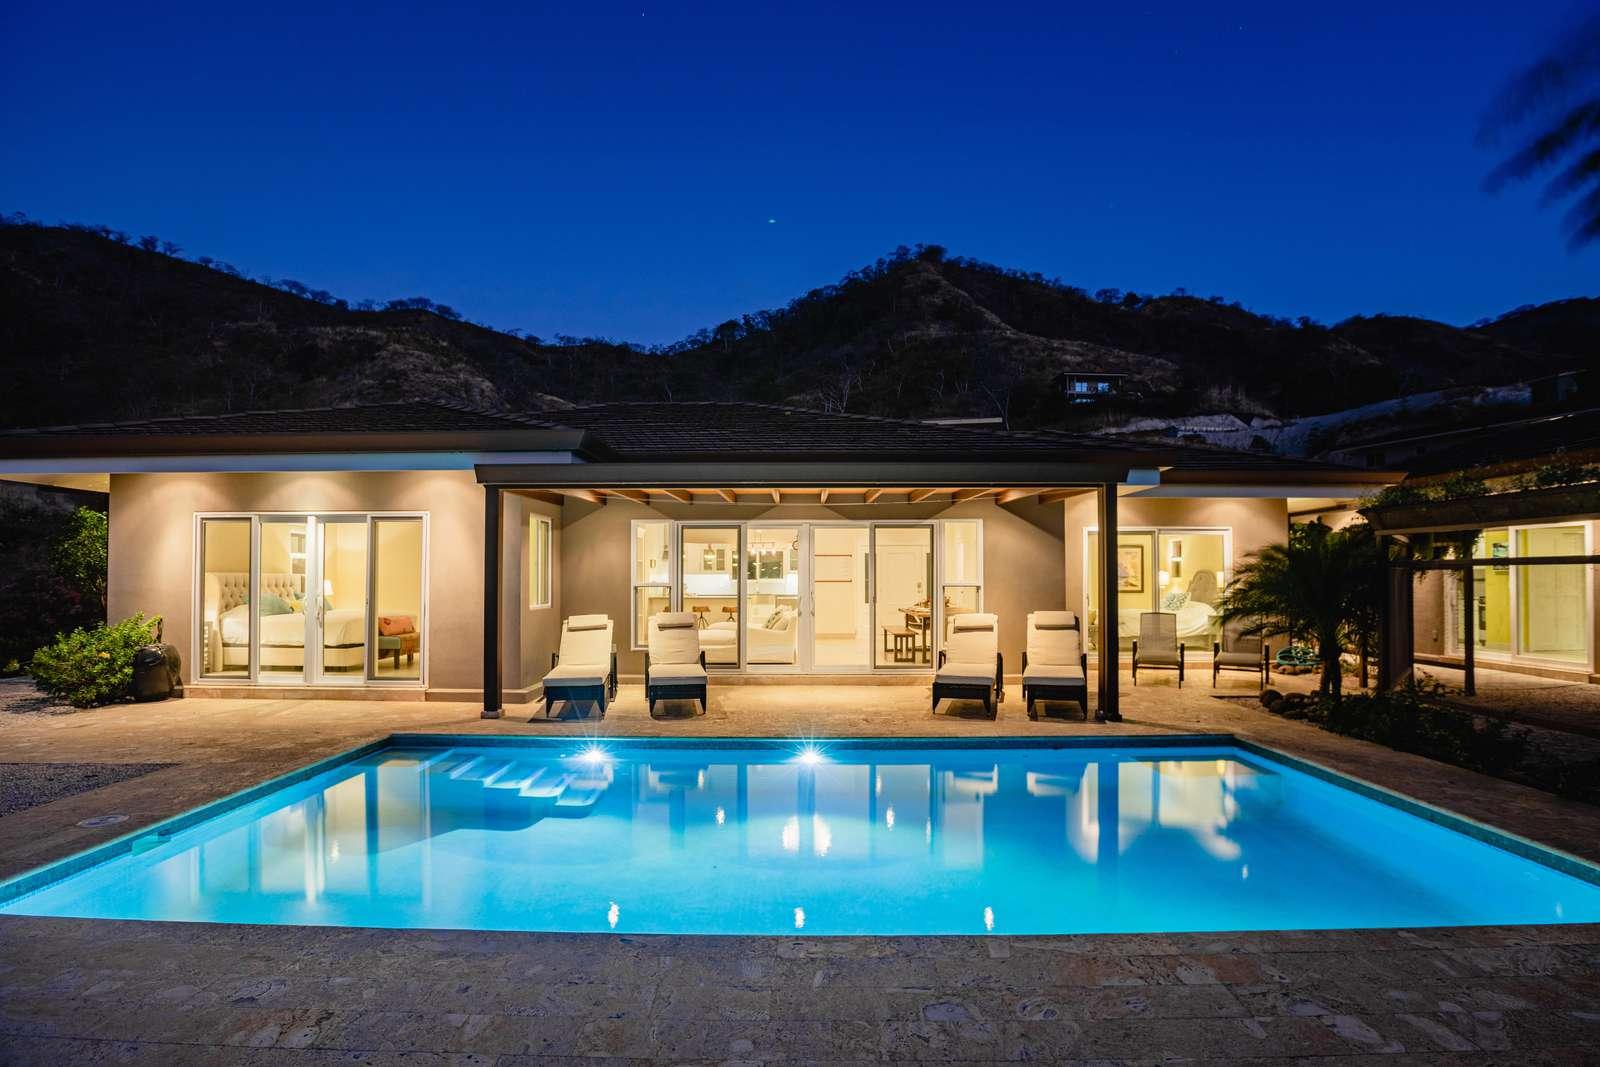 Dos Rios 43, a 4 Bedroom ocean view home at Mar Vista